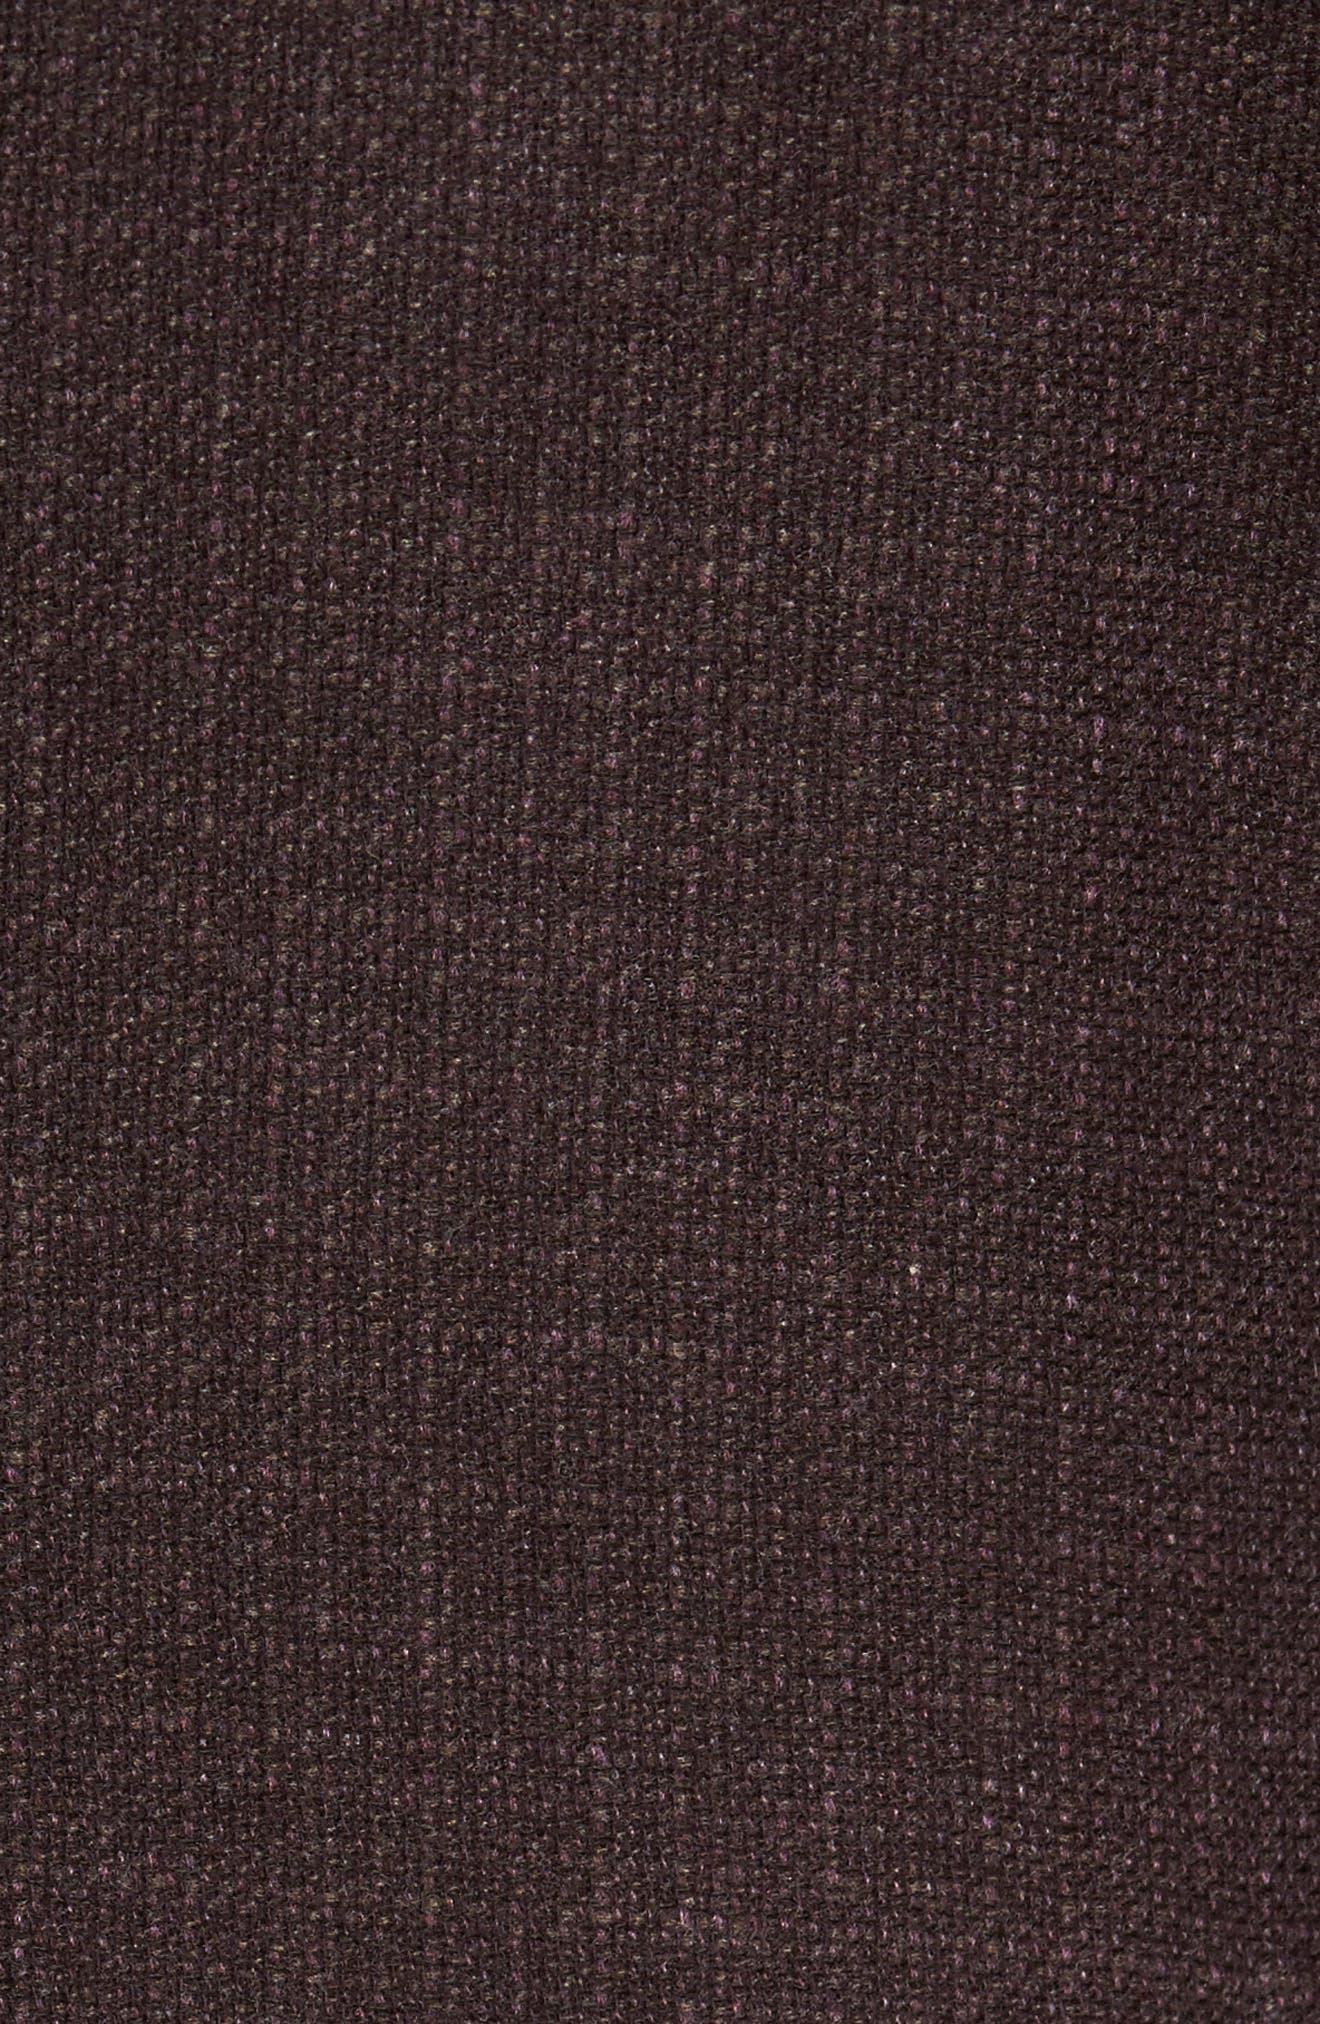 Trim Fit Wool & Cashmere Blazer,                             Alternate thumbnail 5, color,                             Wine